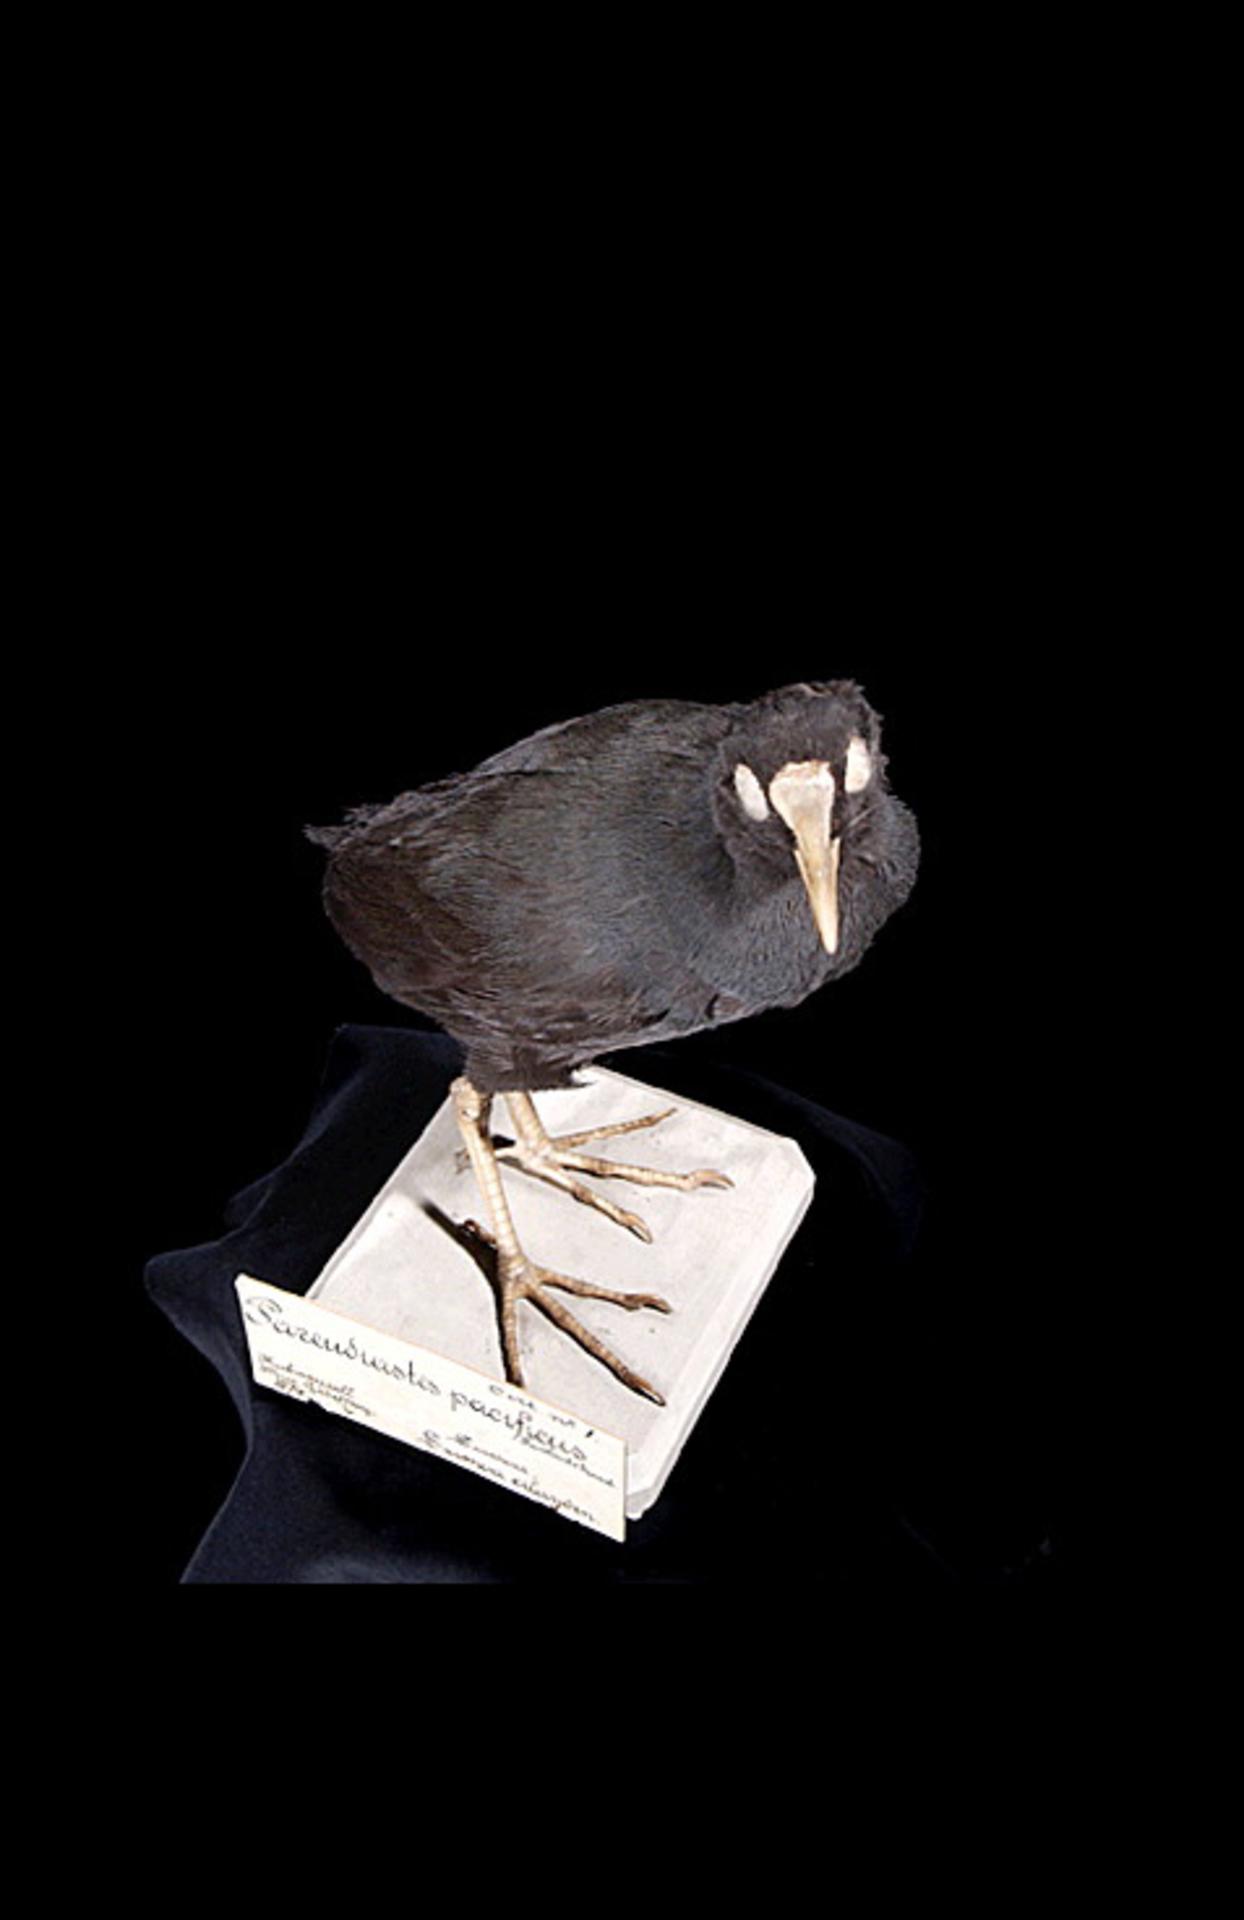 RMNH.AVES.110060   Gallinula pacifica (Hartlaub & Finsch, 1871)